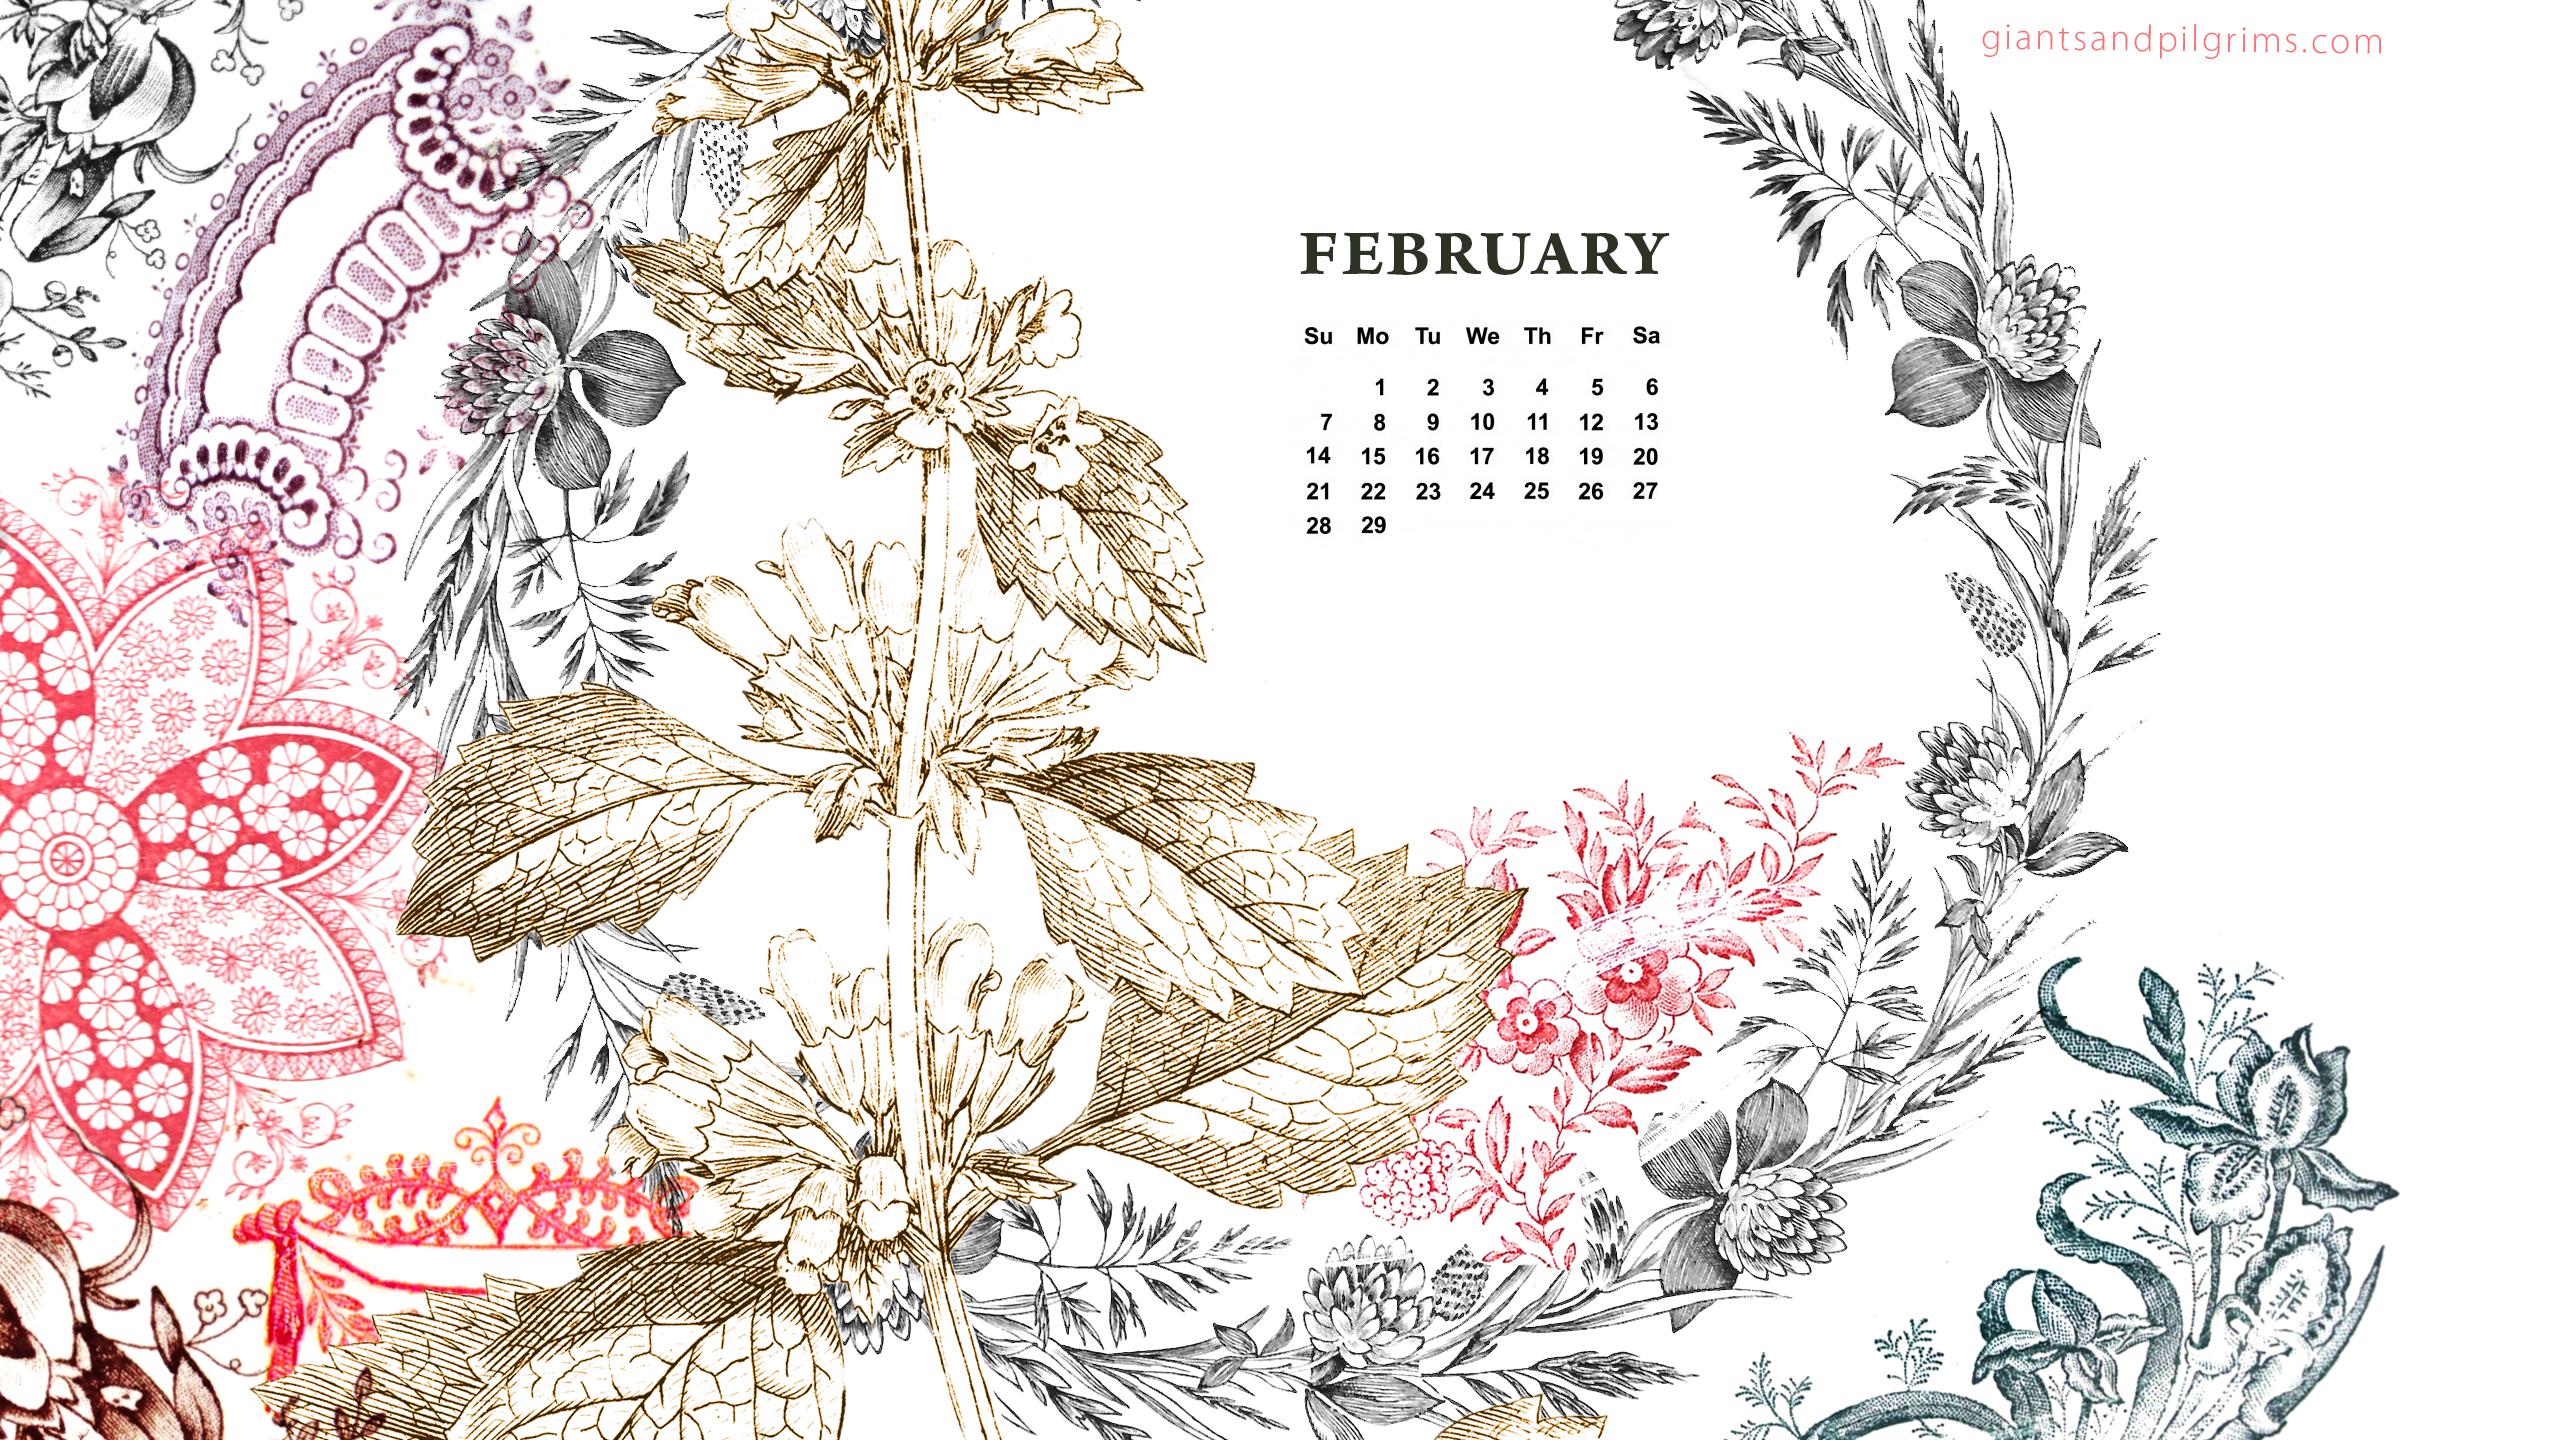 February Calendar 2015 Wallpaper 2MY5Y7O   Picseriocom 2560x1440